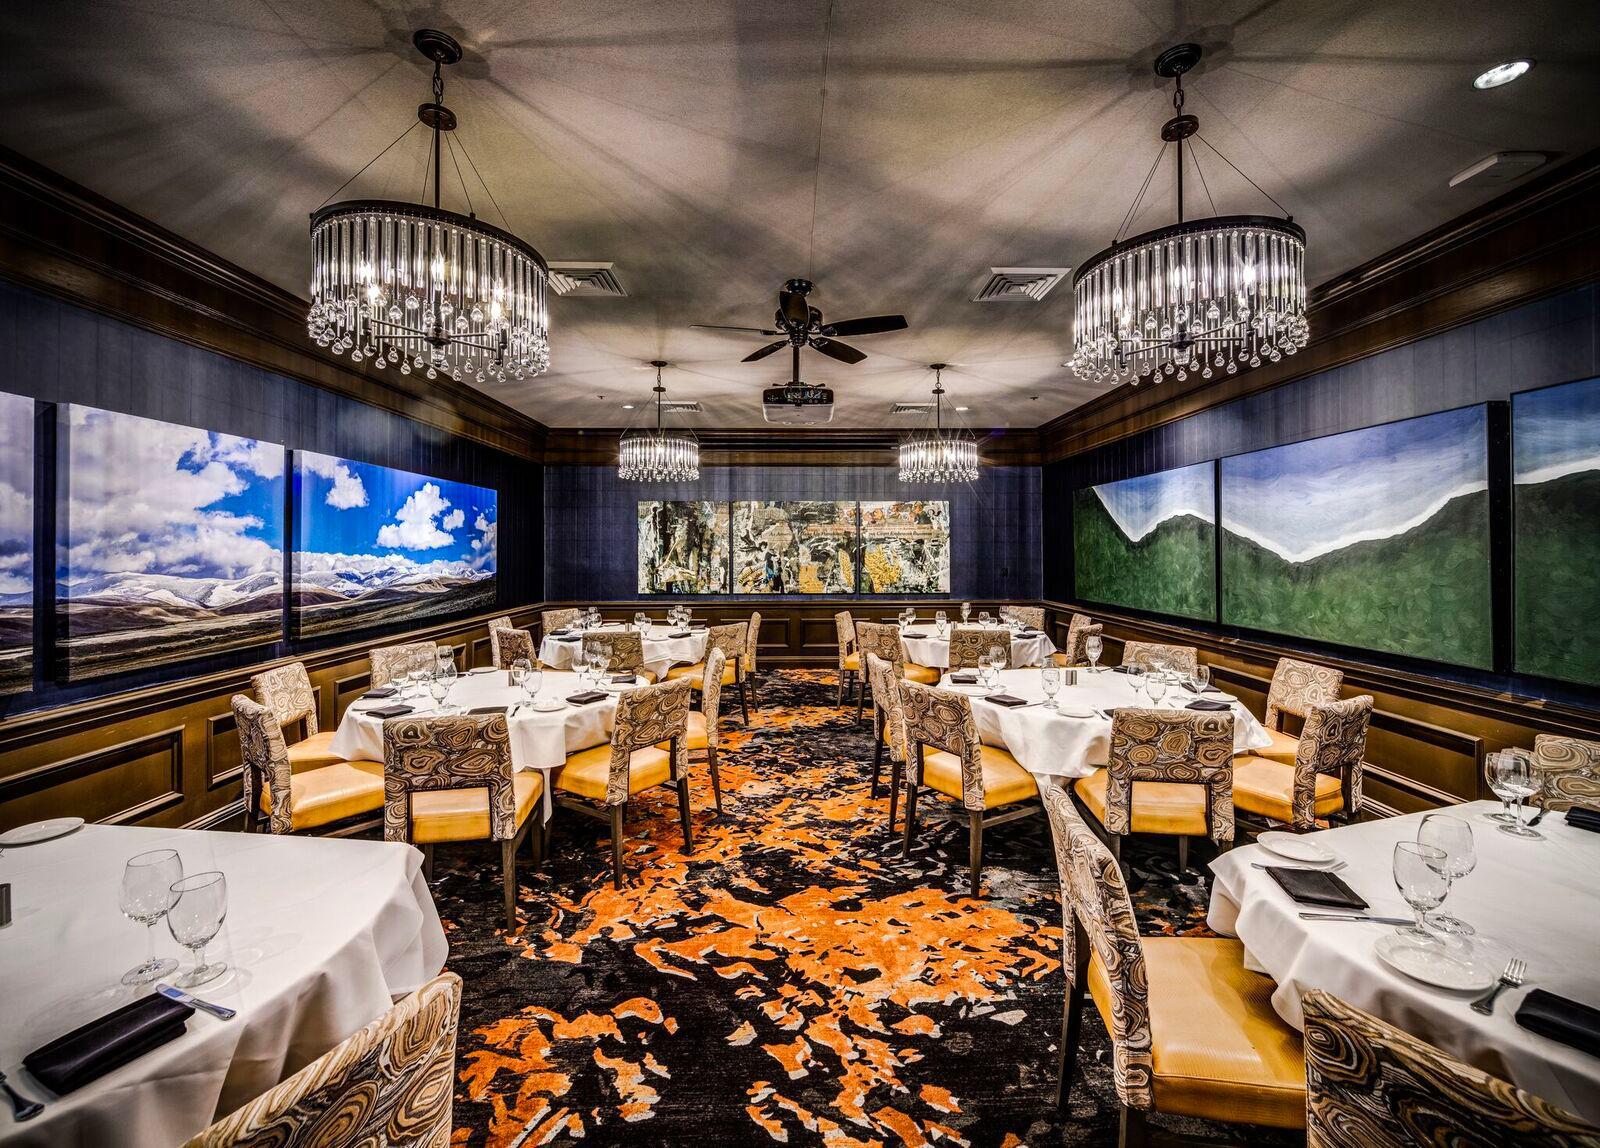 Del Frisco's Double Eagle Steakhouse Denver Colorado Room private dining room